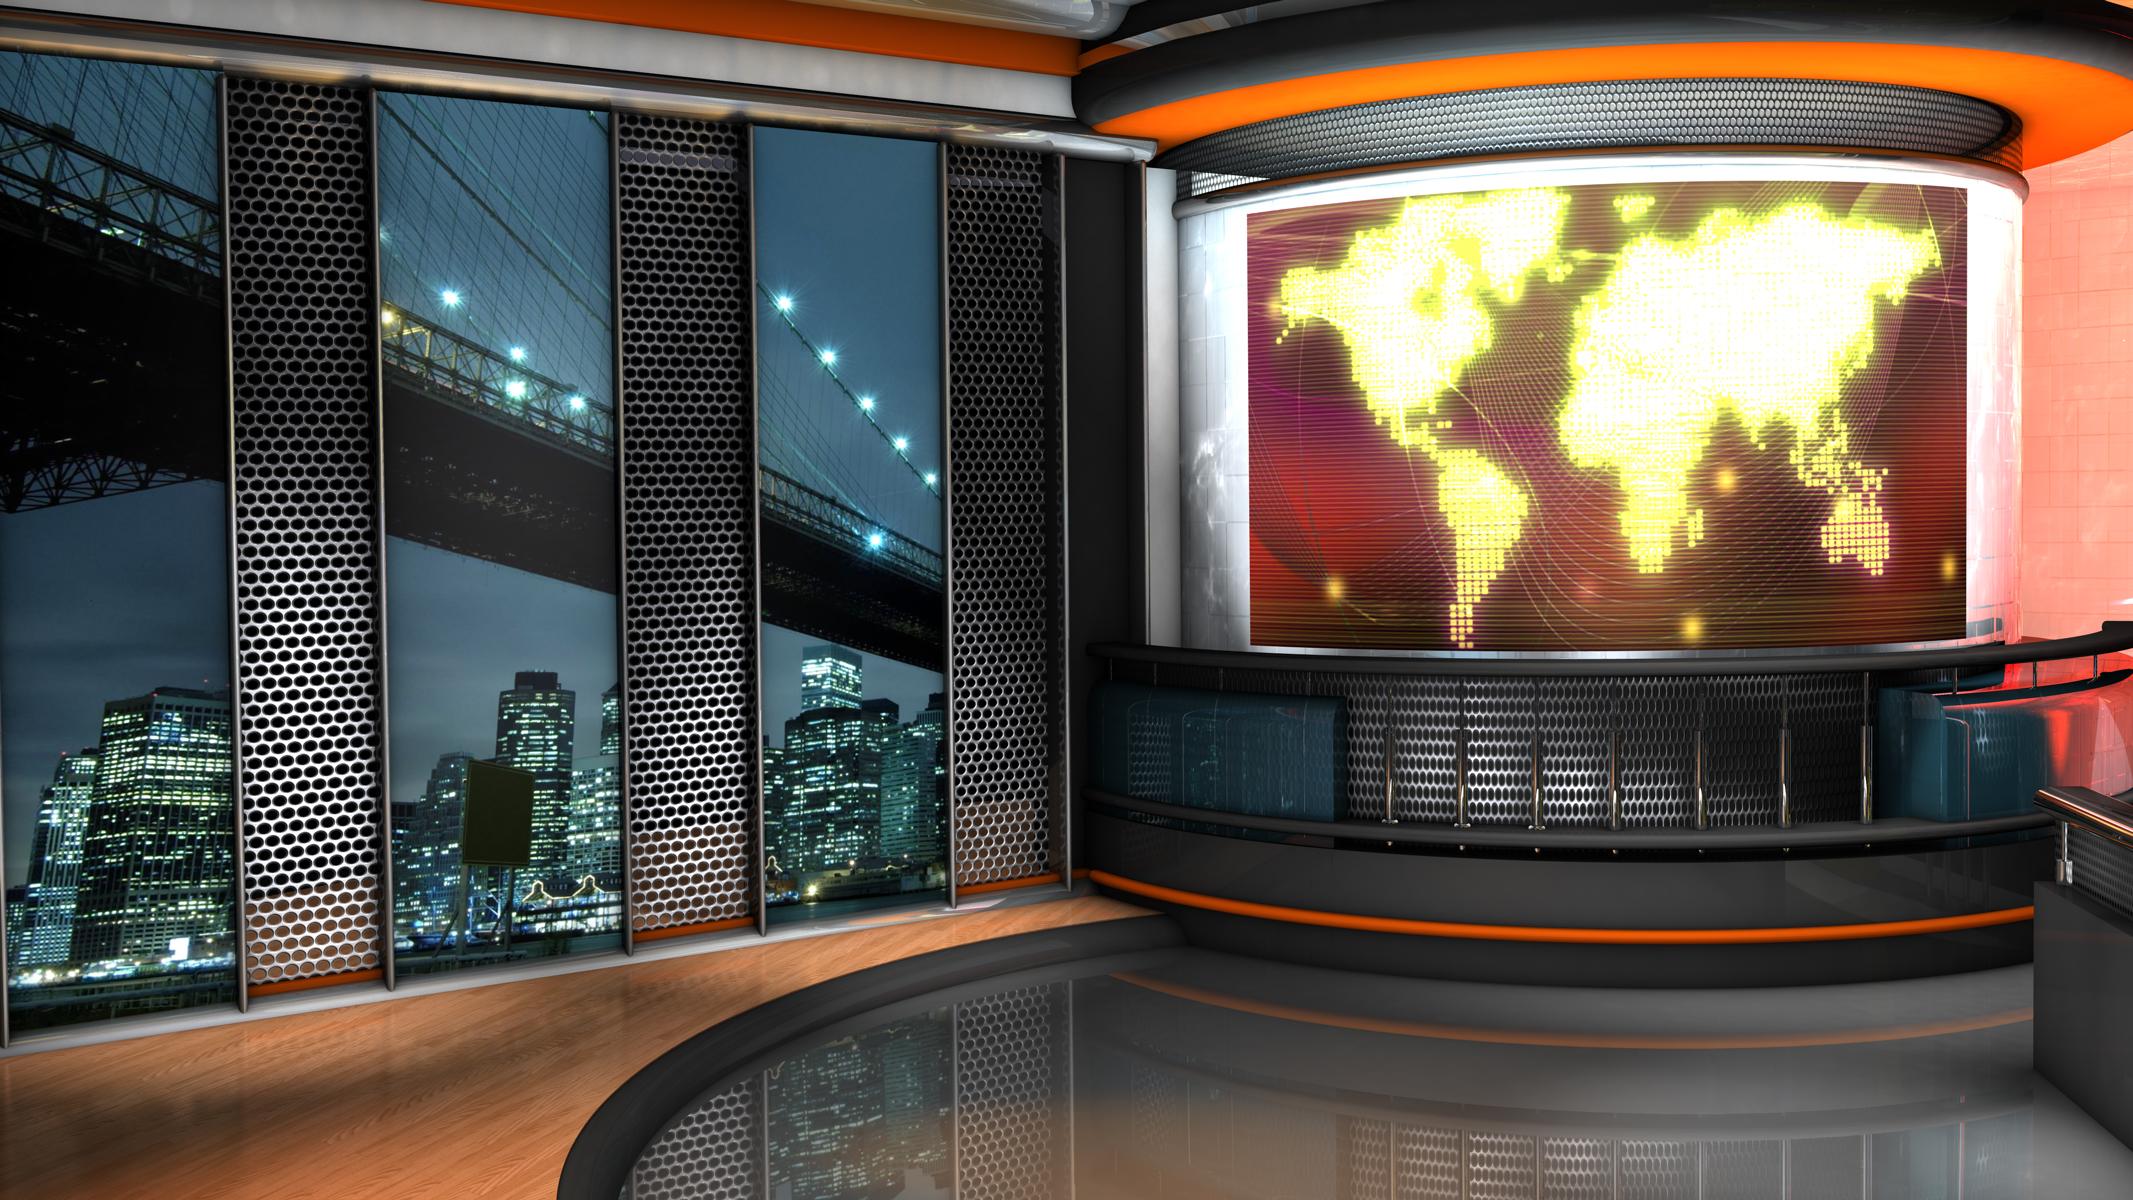 News-Channel-S1.jpg